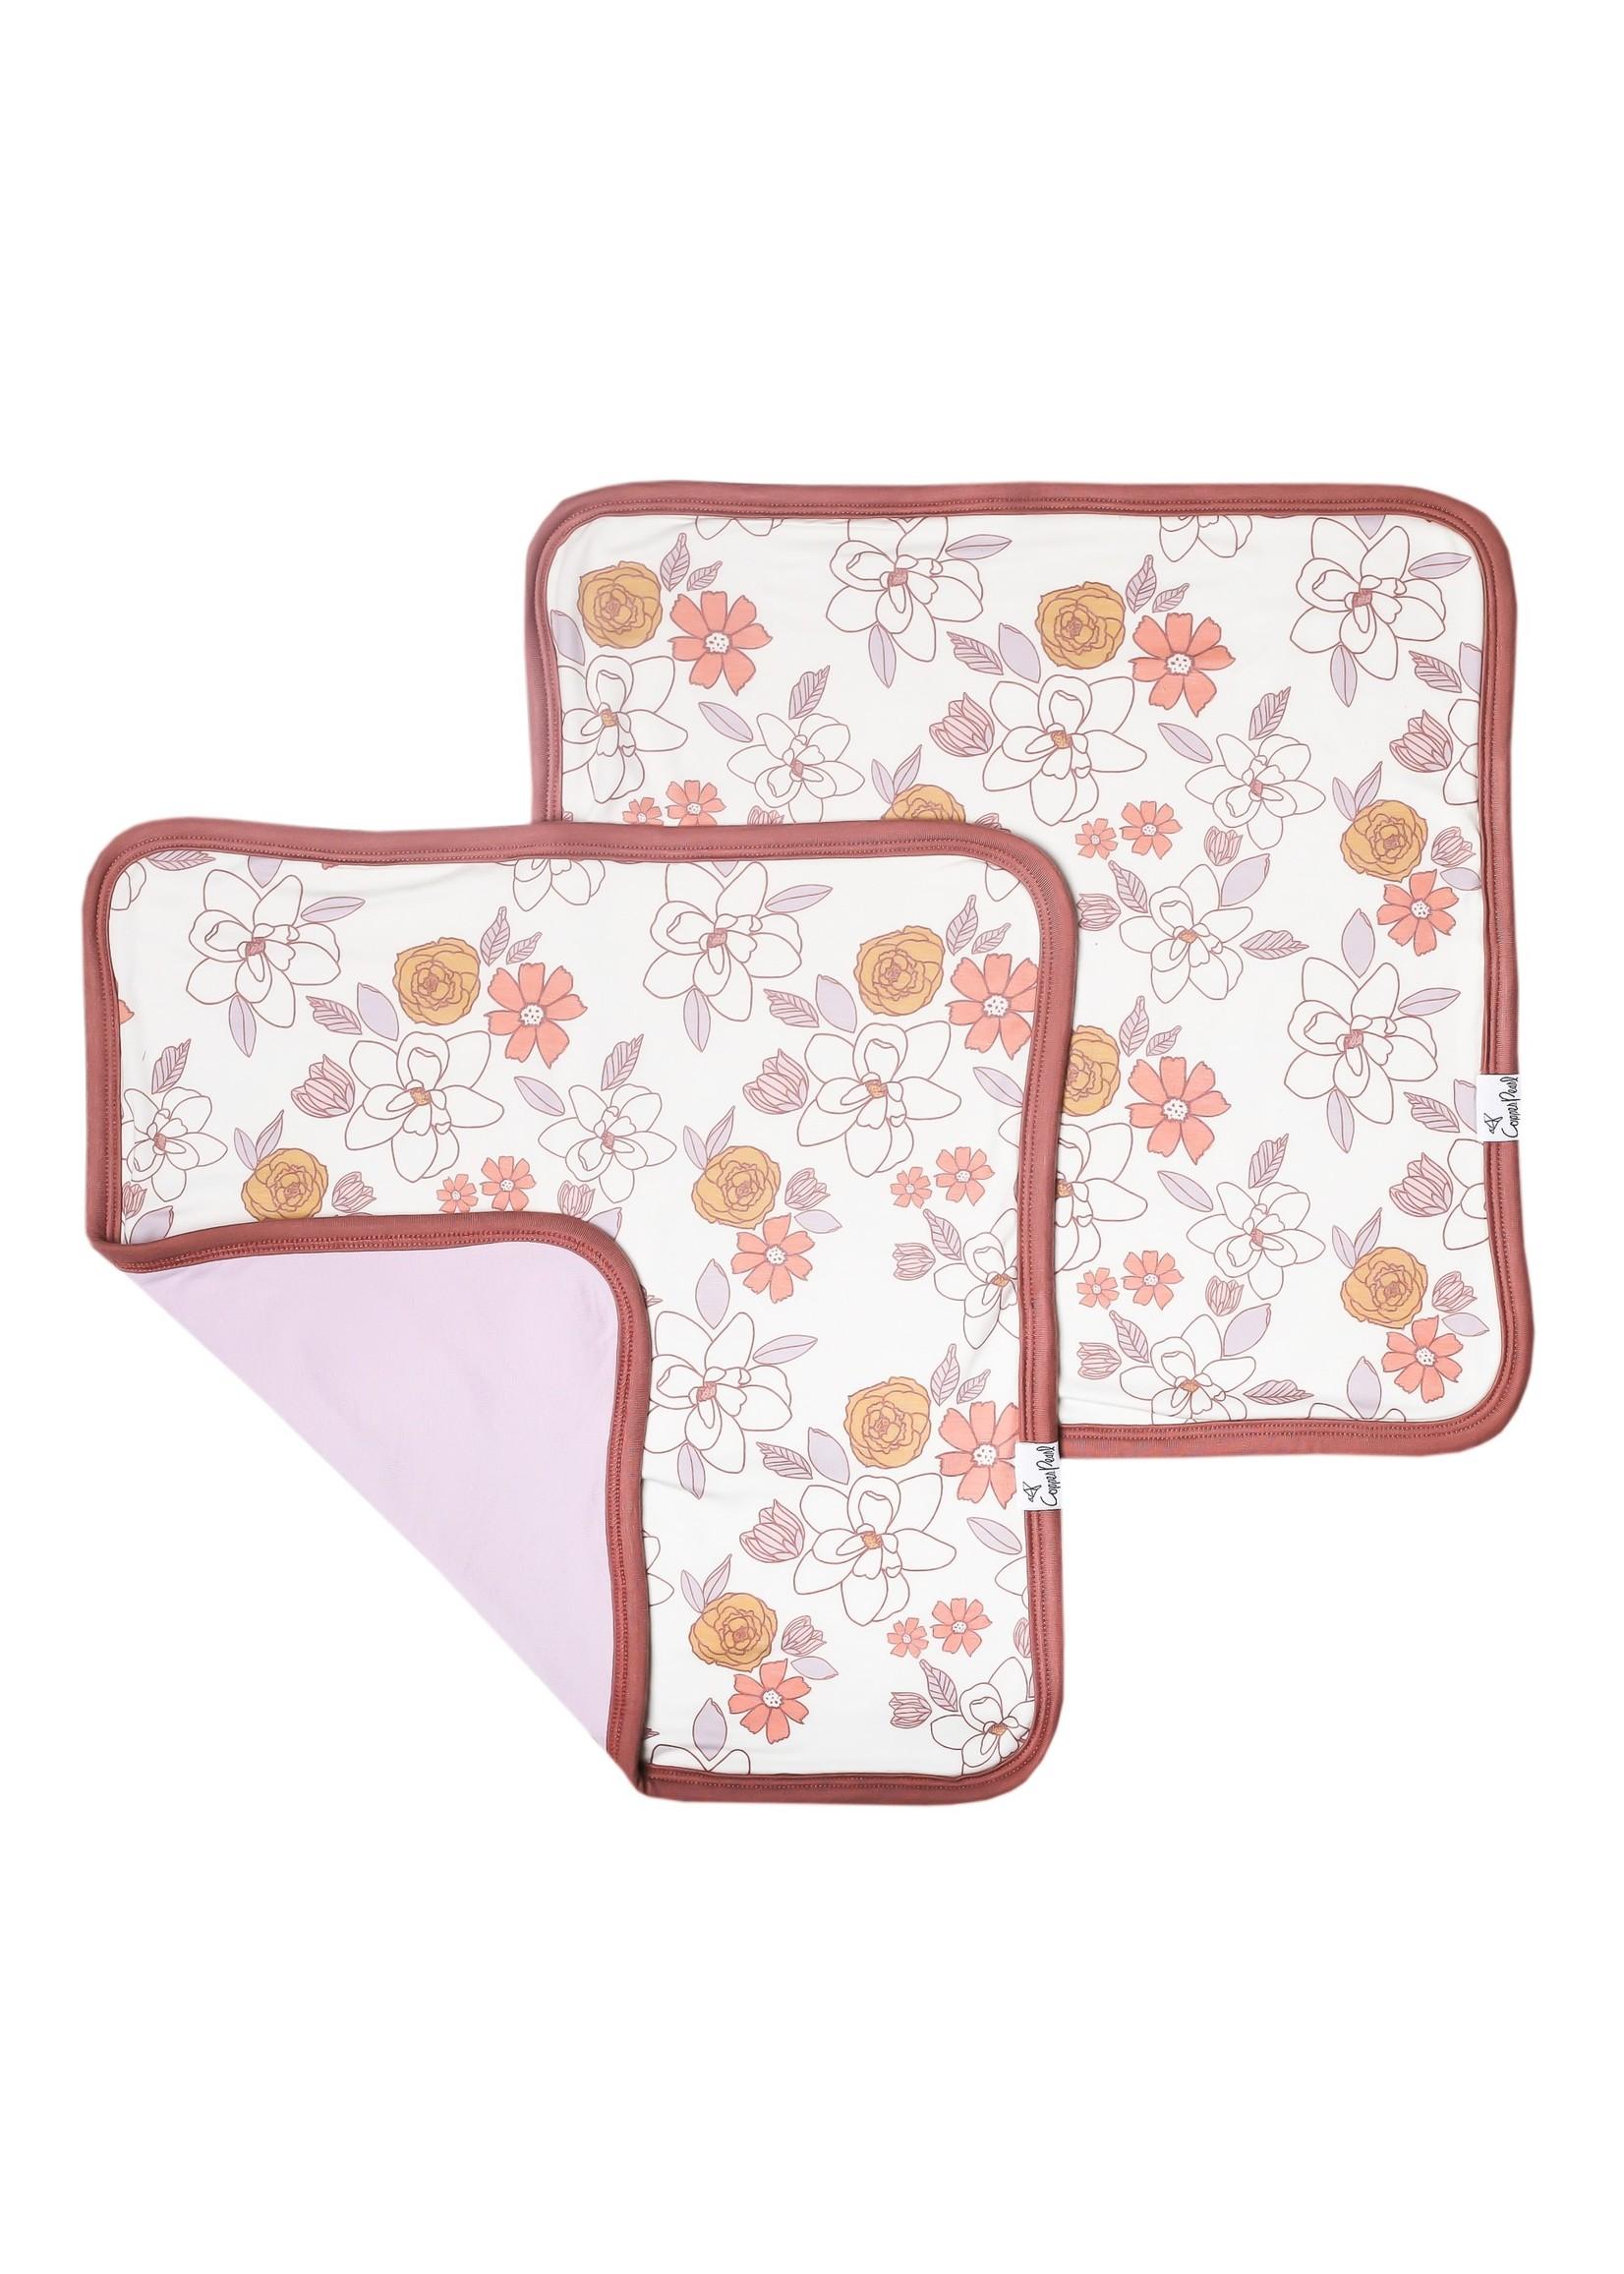 Copper pearl Security Blanket - Ferra